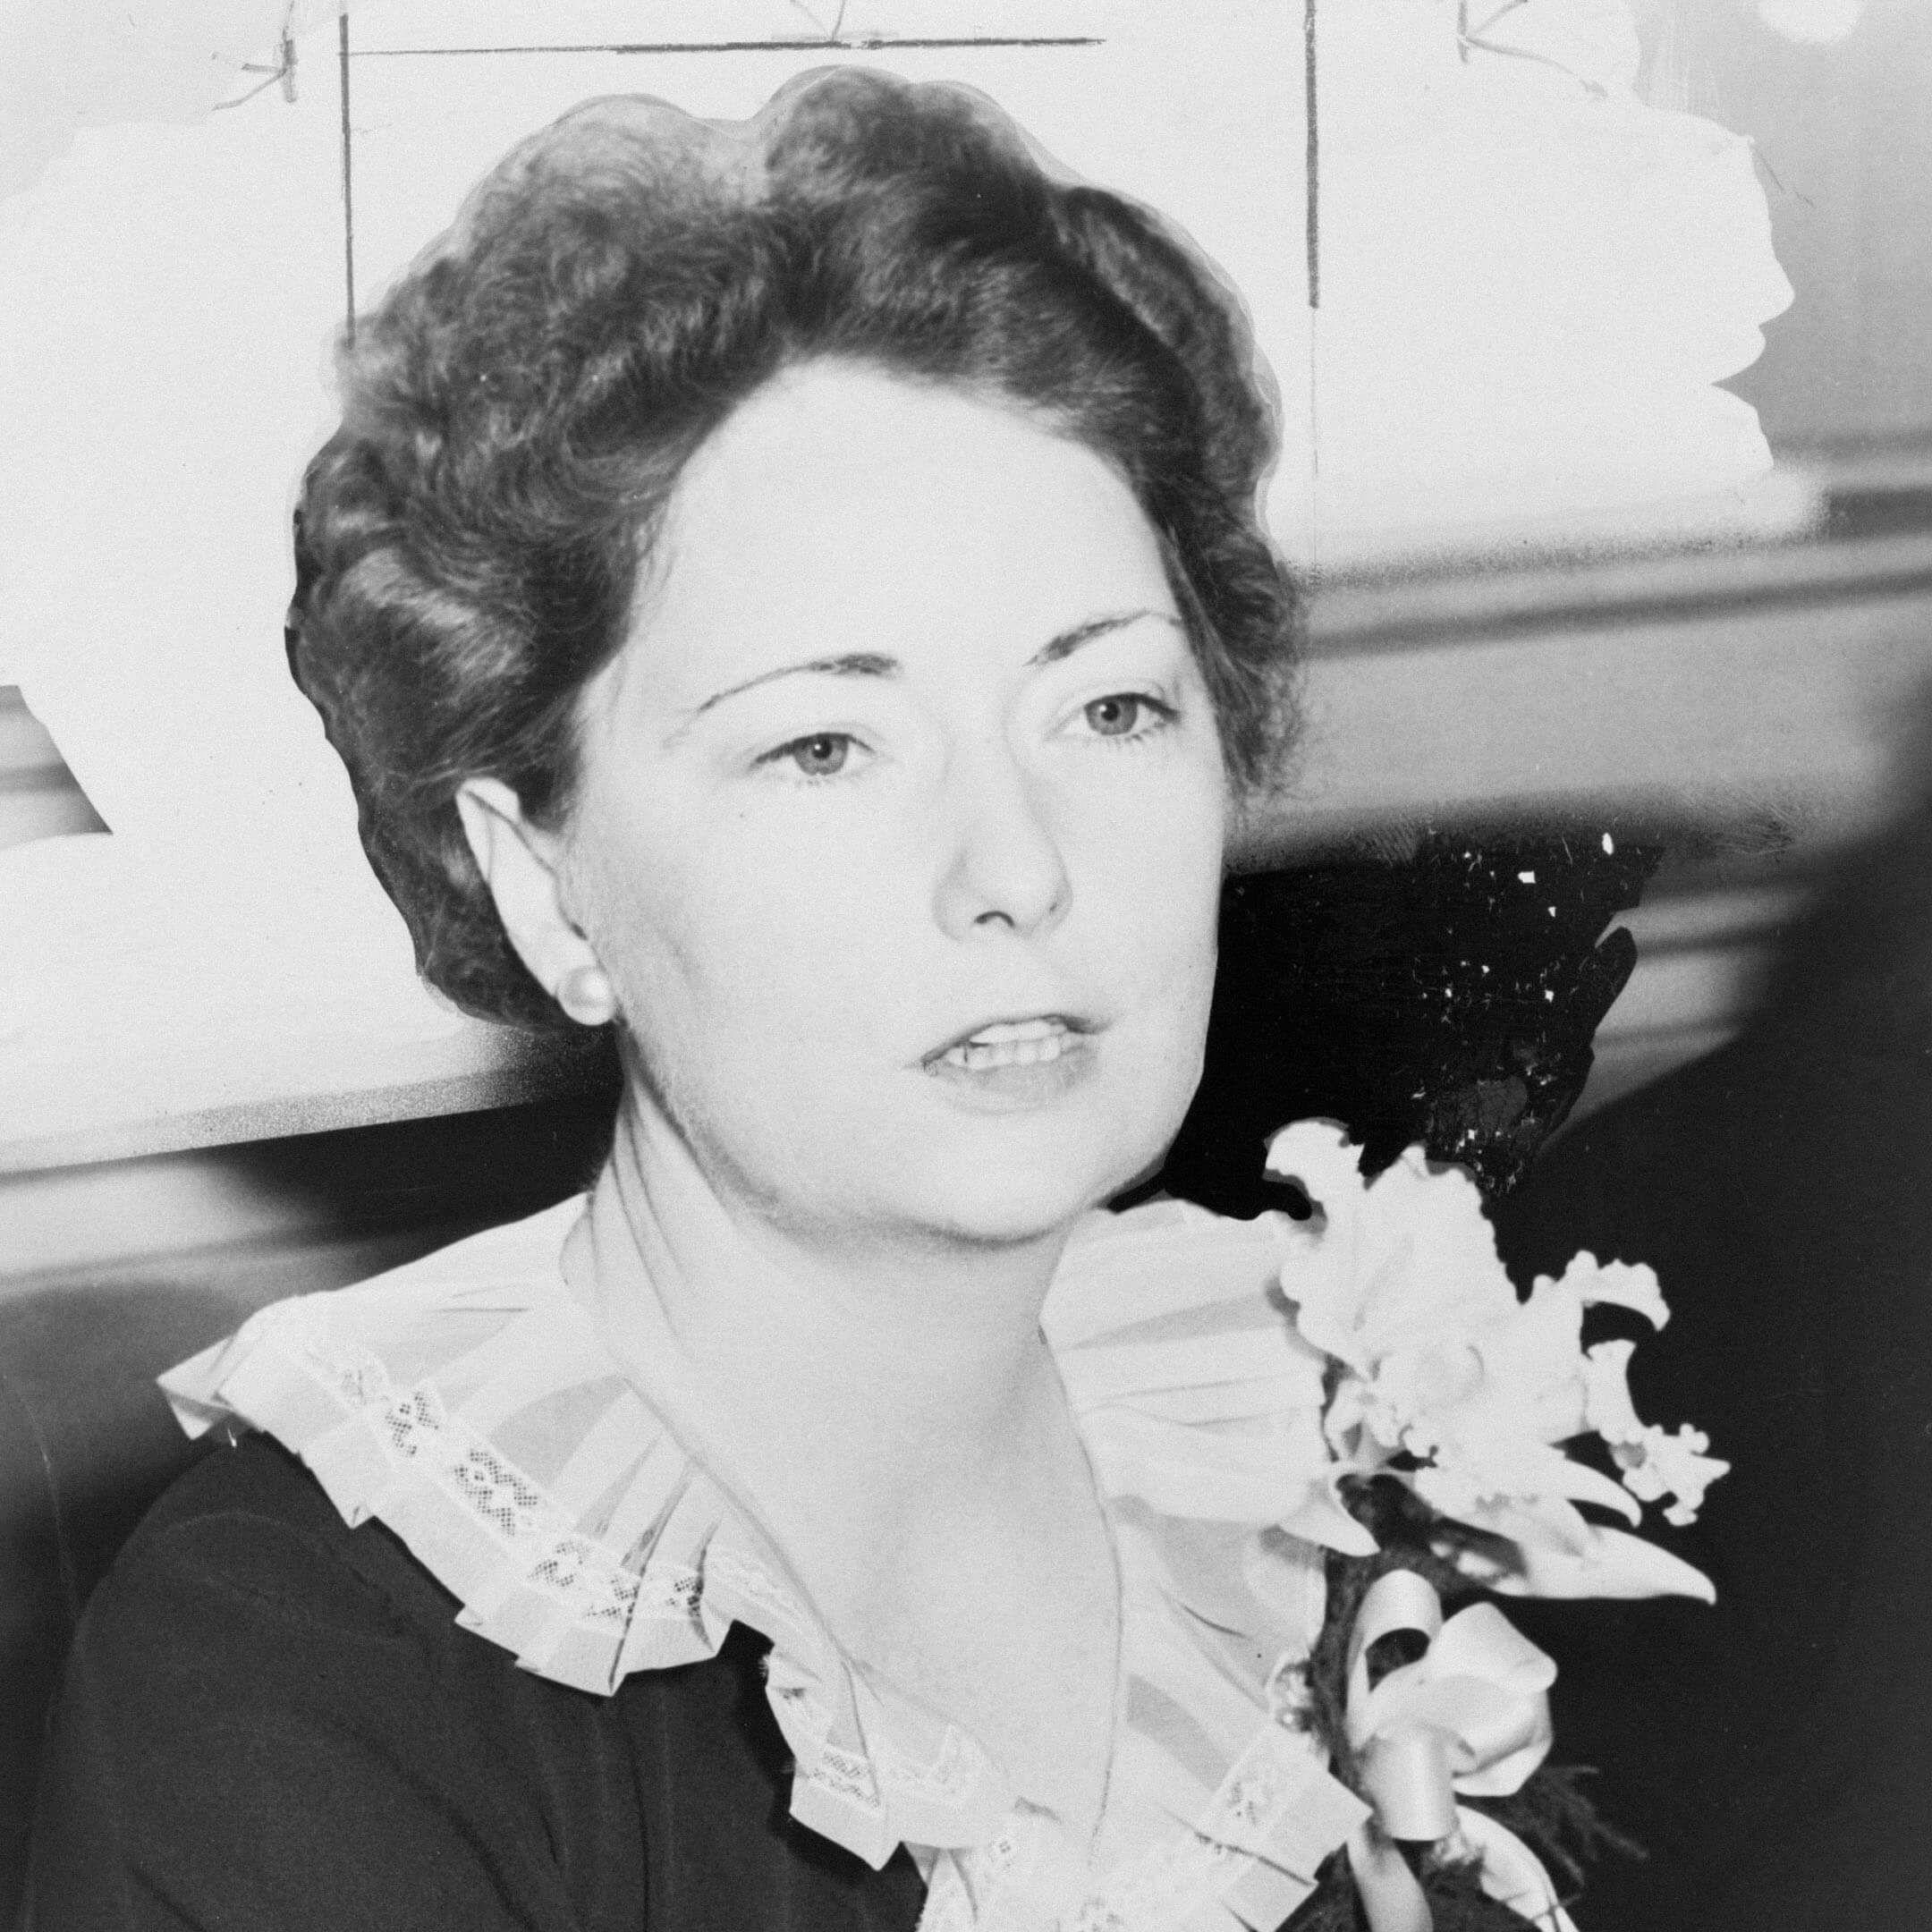 Маргарет Митчелл в1941году. Источник: Wikimedia Commons